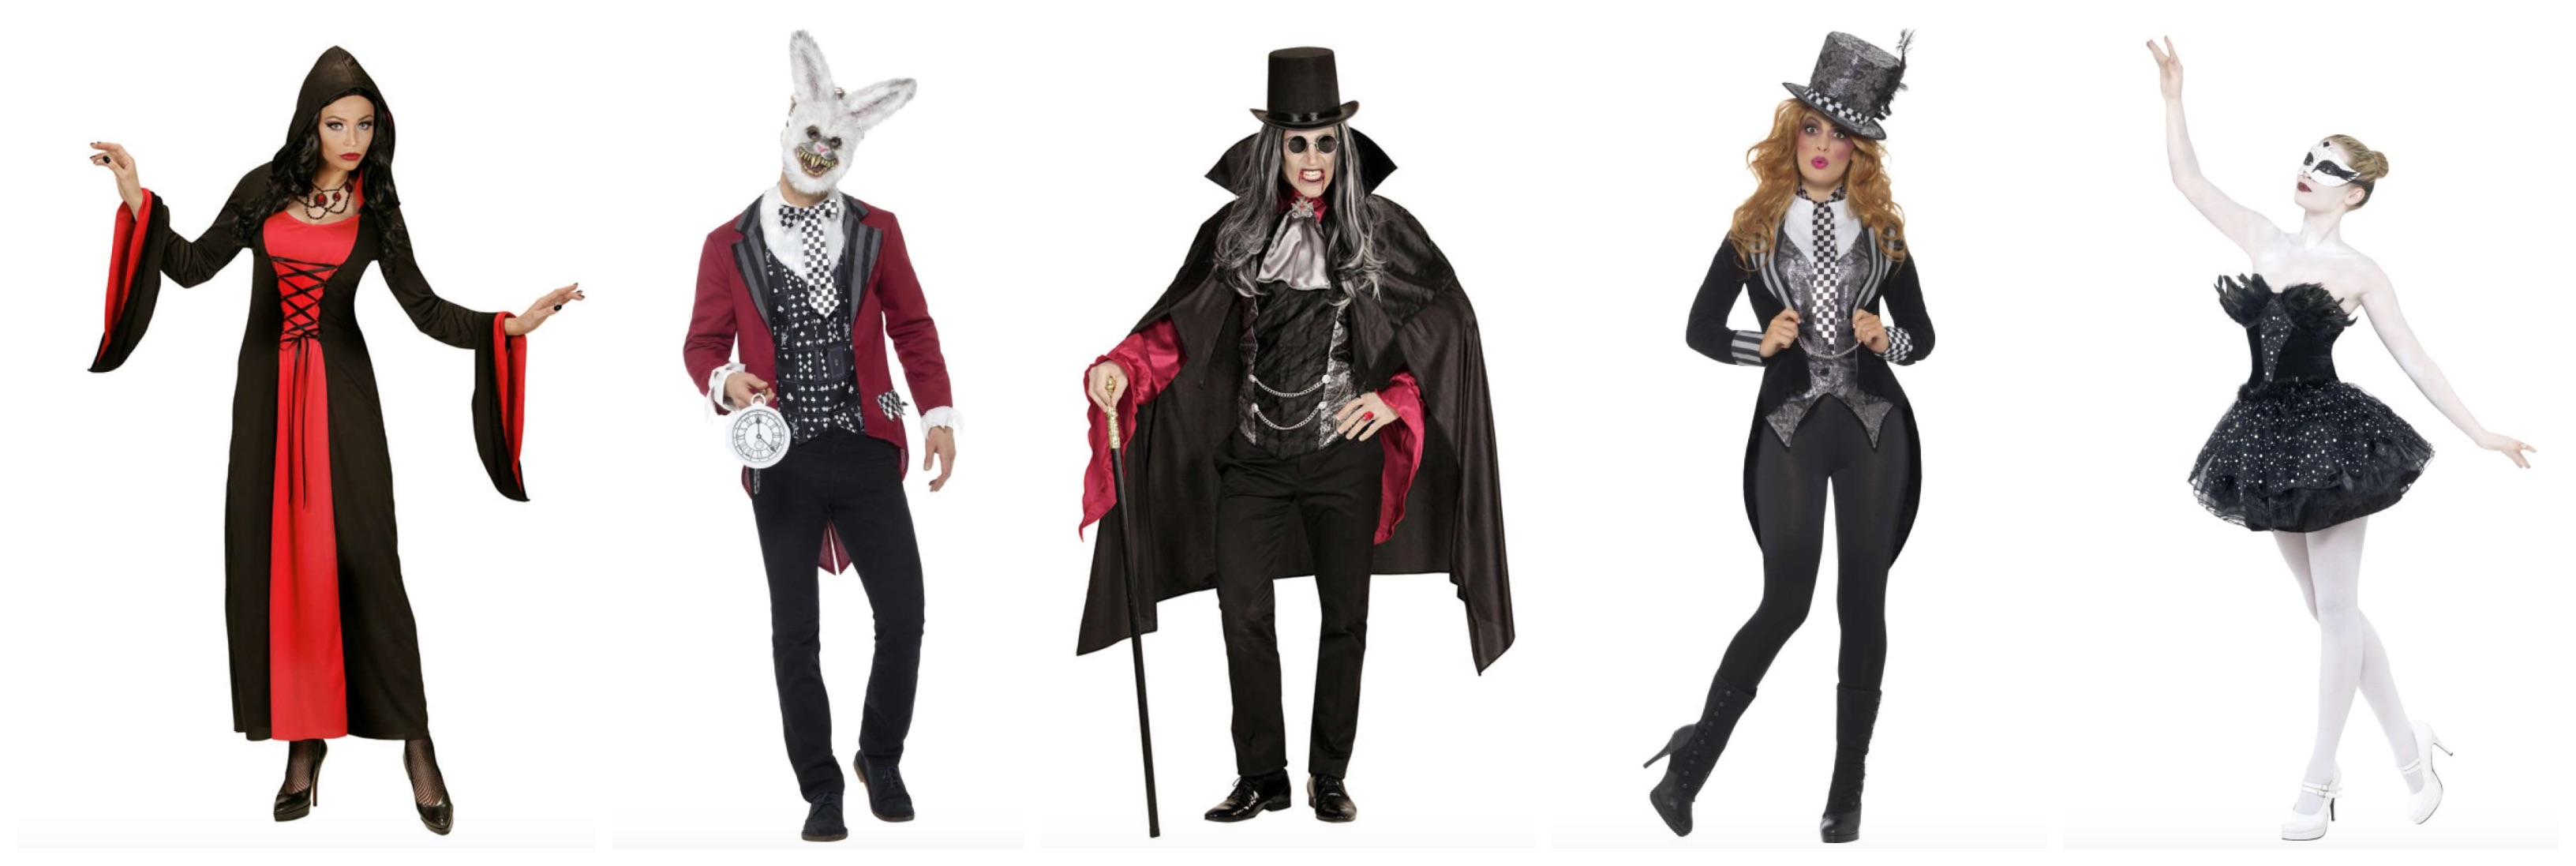 gotisk kostume til voksne - Gotisk kostume til voksne